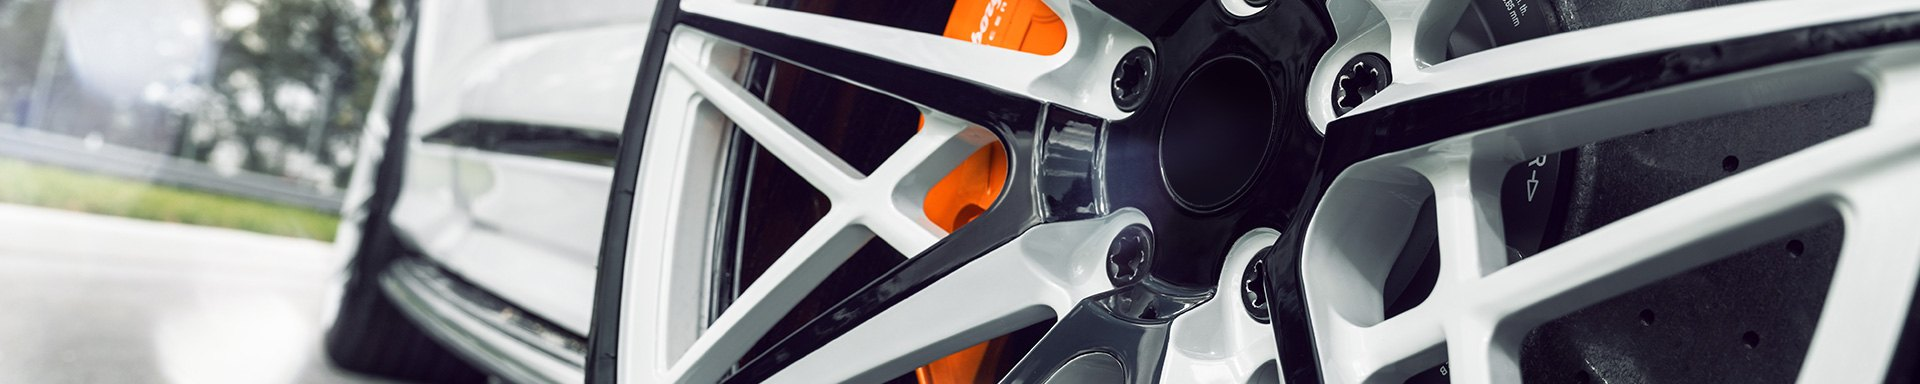 Wheels & Tires | Lug Nuts & Locks, TPMS Sensors, Accessories